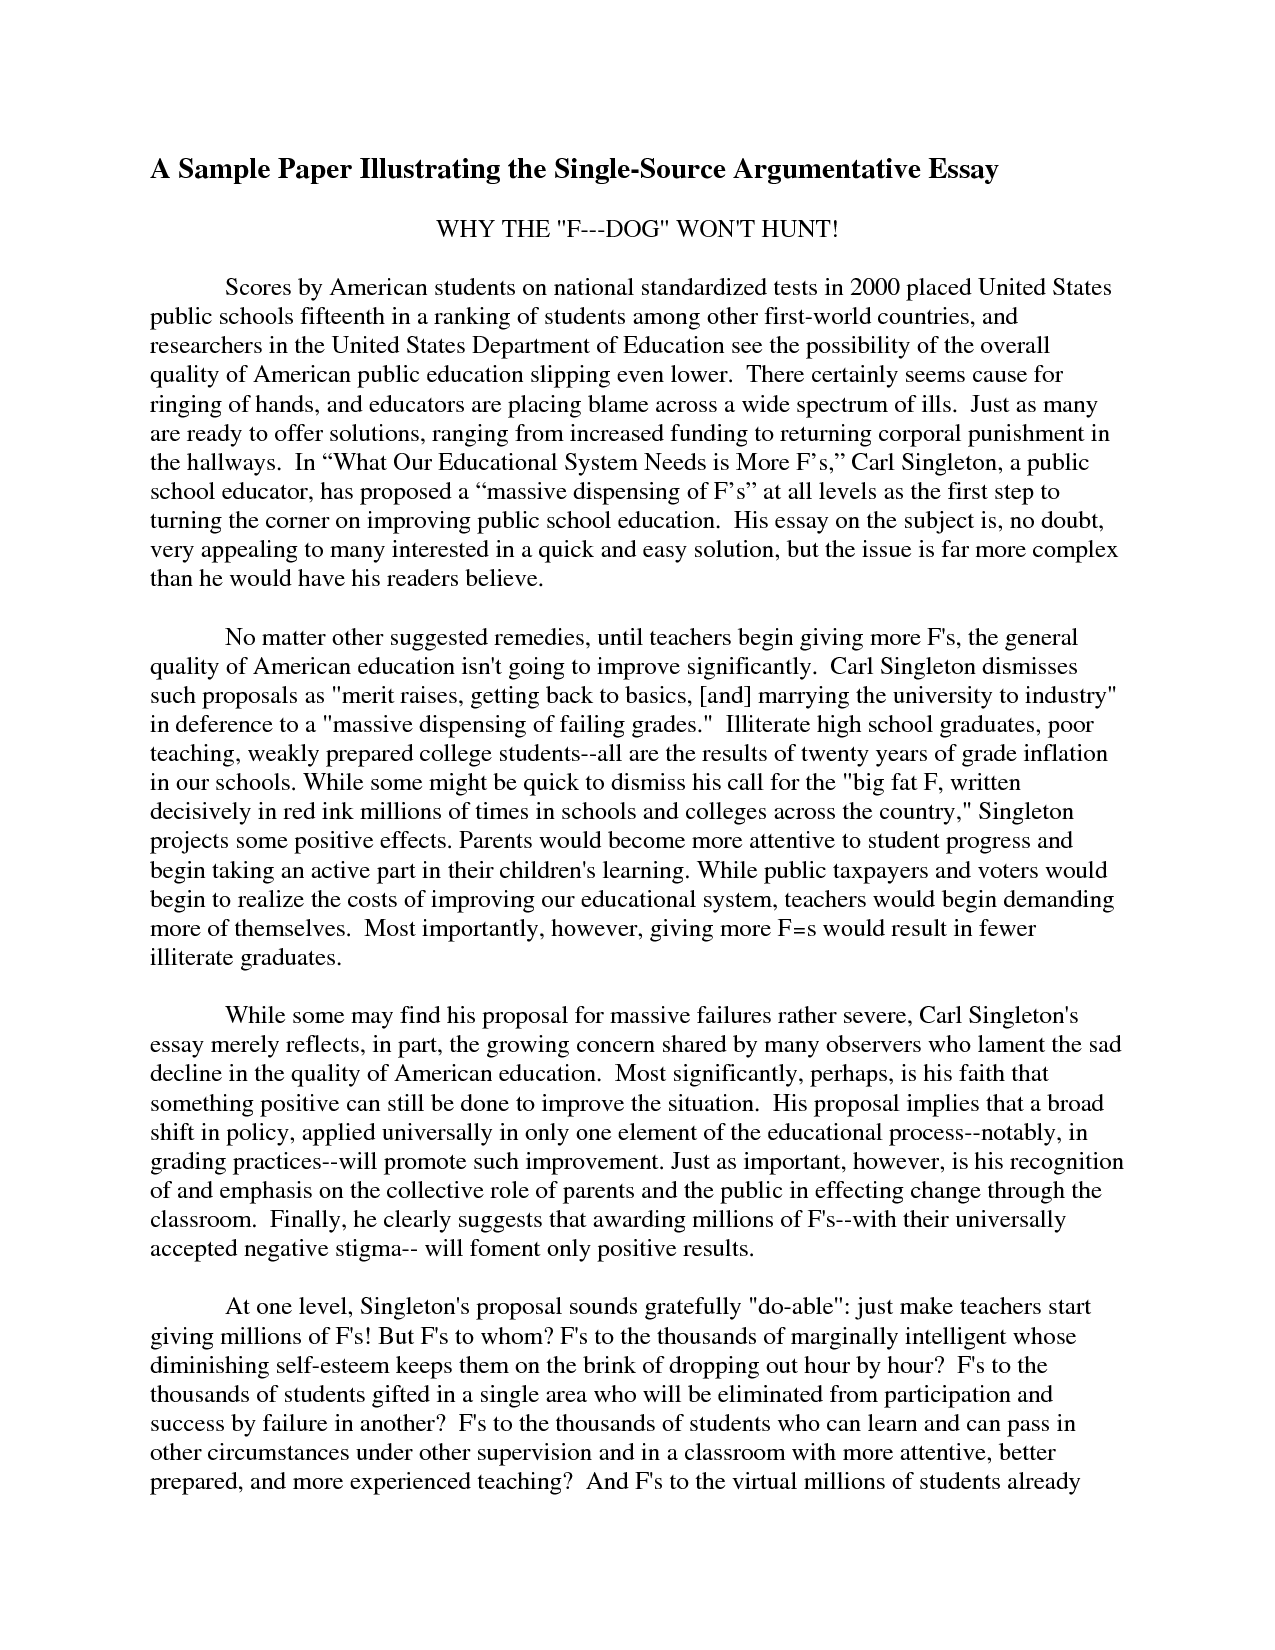 010 Fyvb2pmxix Argument Essay Breathtaking Example Ap Lang Argumentative Template High School Topics Full